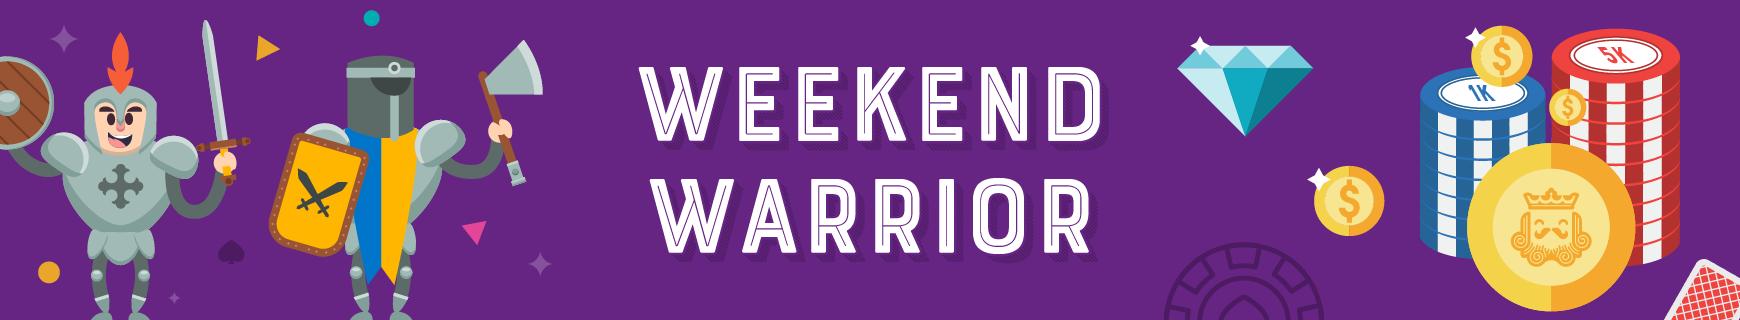 Weekend warrior %28870 x 160%29 2x